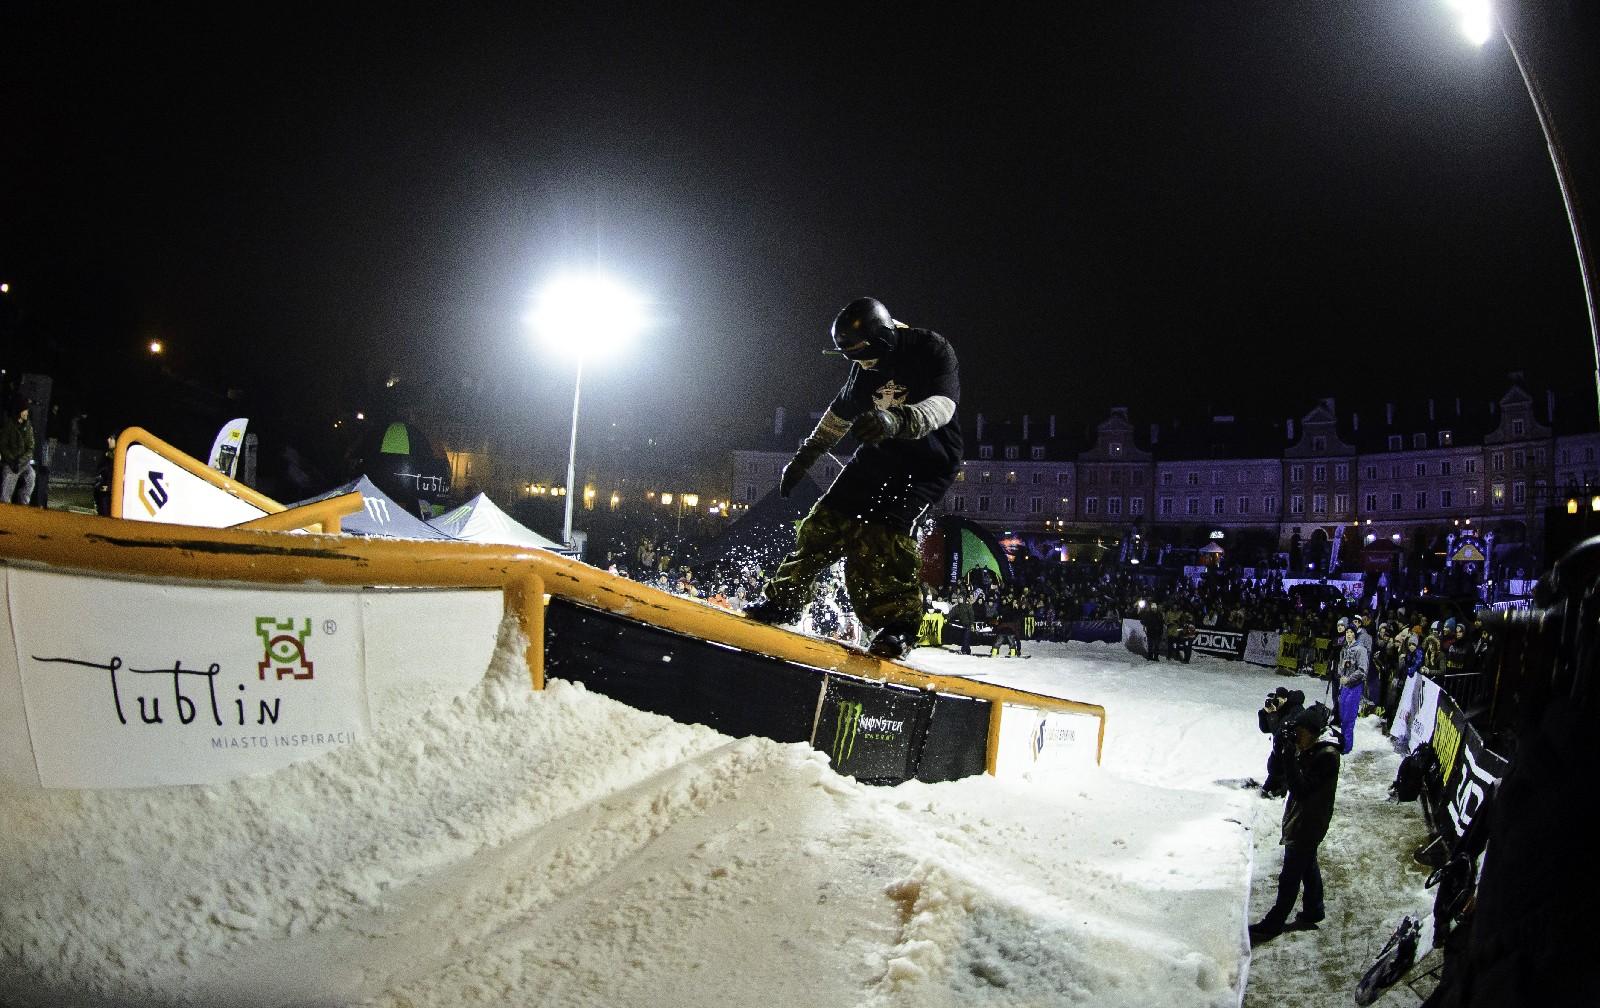 Lublin Sportival 2014